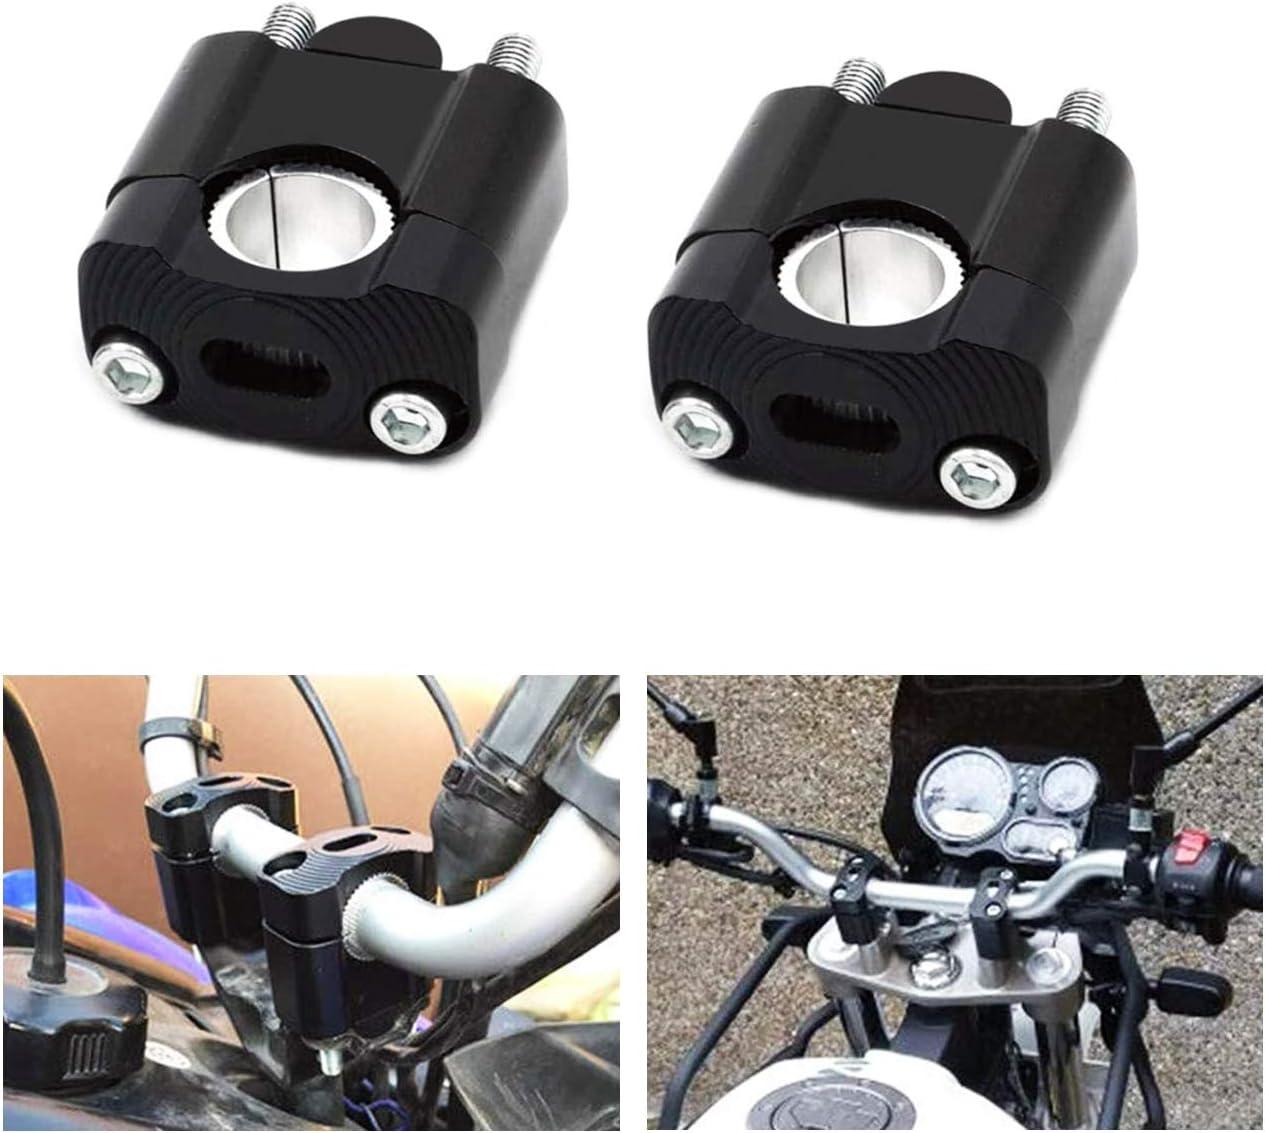 28mm Black 7//8 Universal Handlebars Clamp Riser Taper Dirt Bike Motocross MOTL Motorcycle Handlebar Risers for 1-1//8 22mm